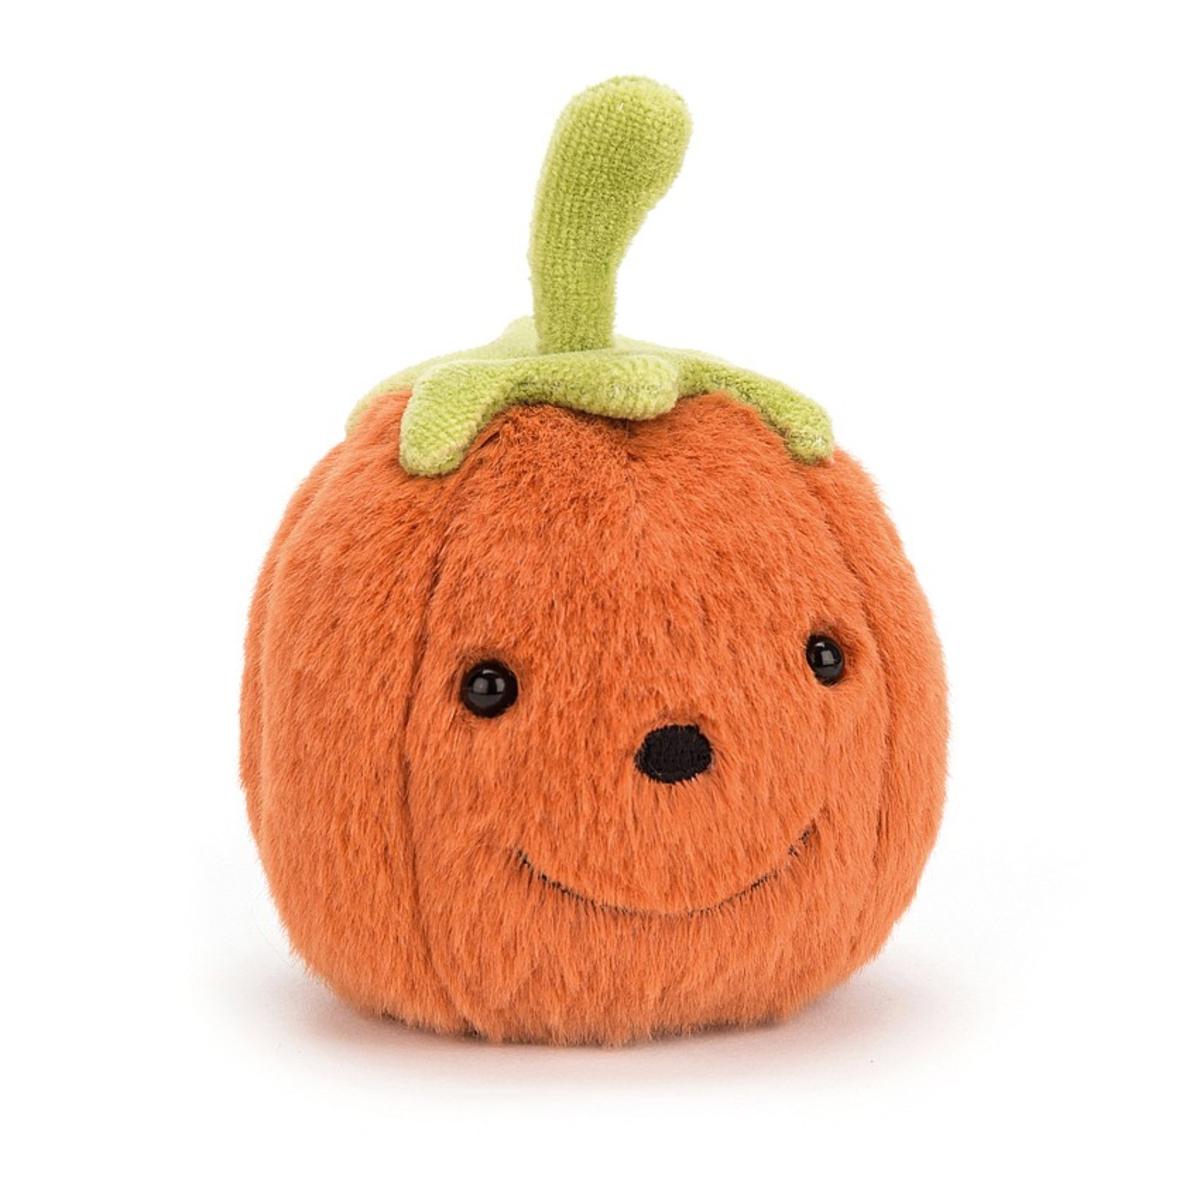 Peluche Petite Peluche Fluffy Pumpkin 8 cm Petite Peluche Fluffy Pumpkin 8 cm